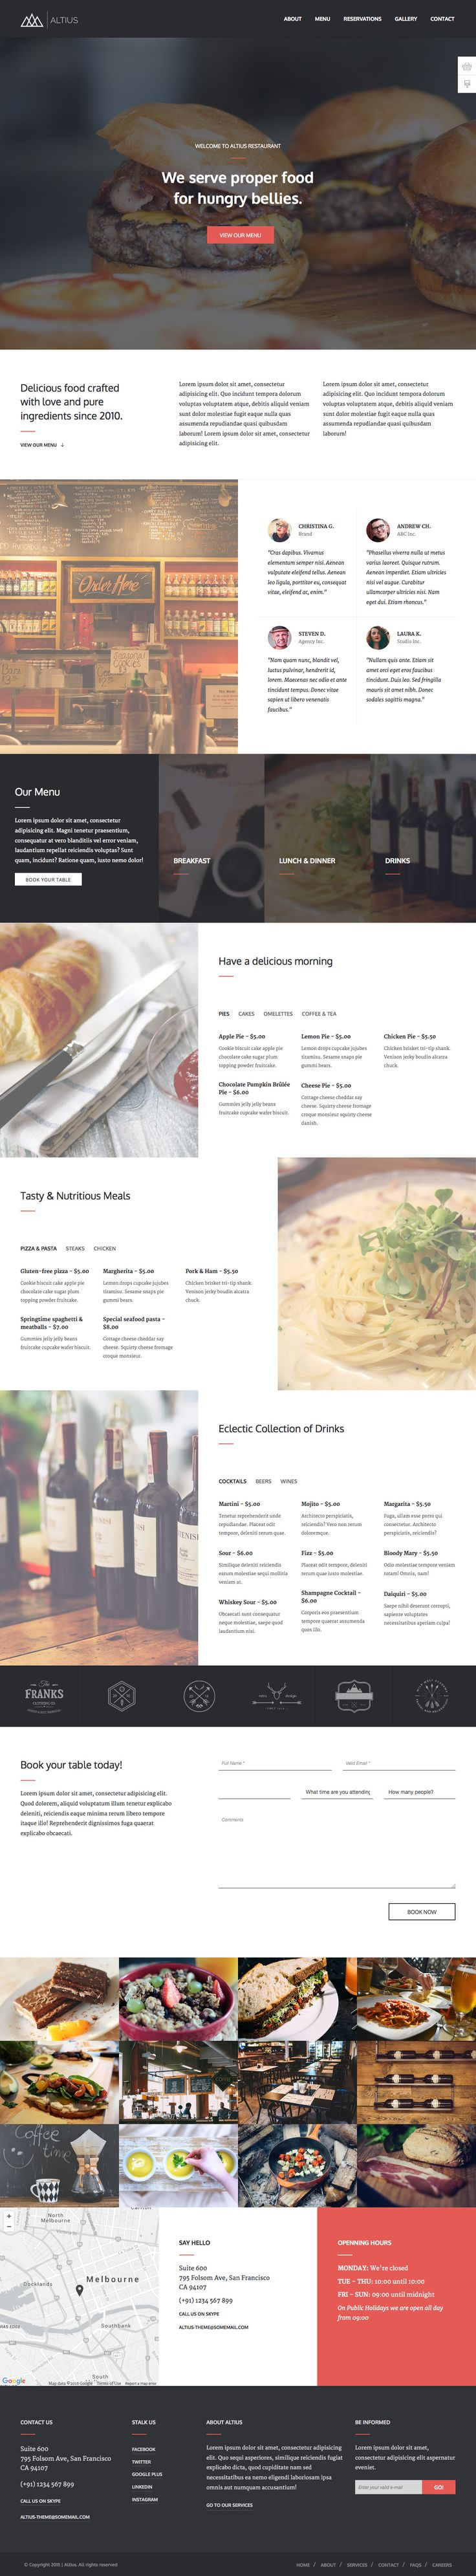 Altius - One Page Restaurant HTML Template #website #web #onepage #webdesign #restaurant #food